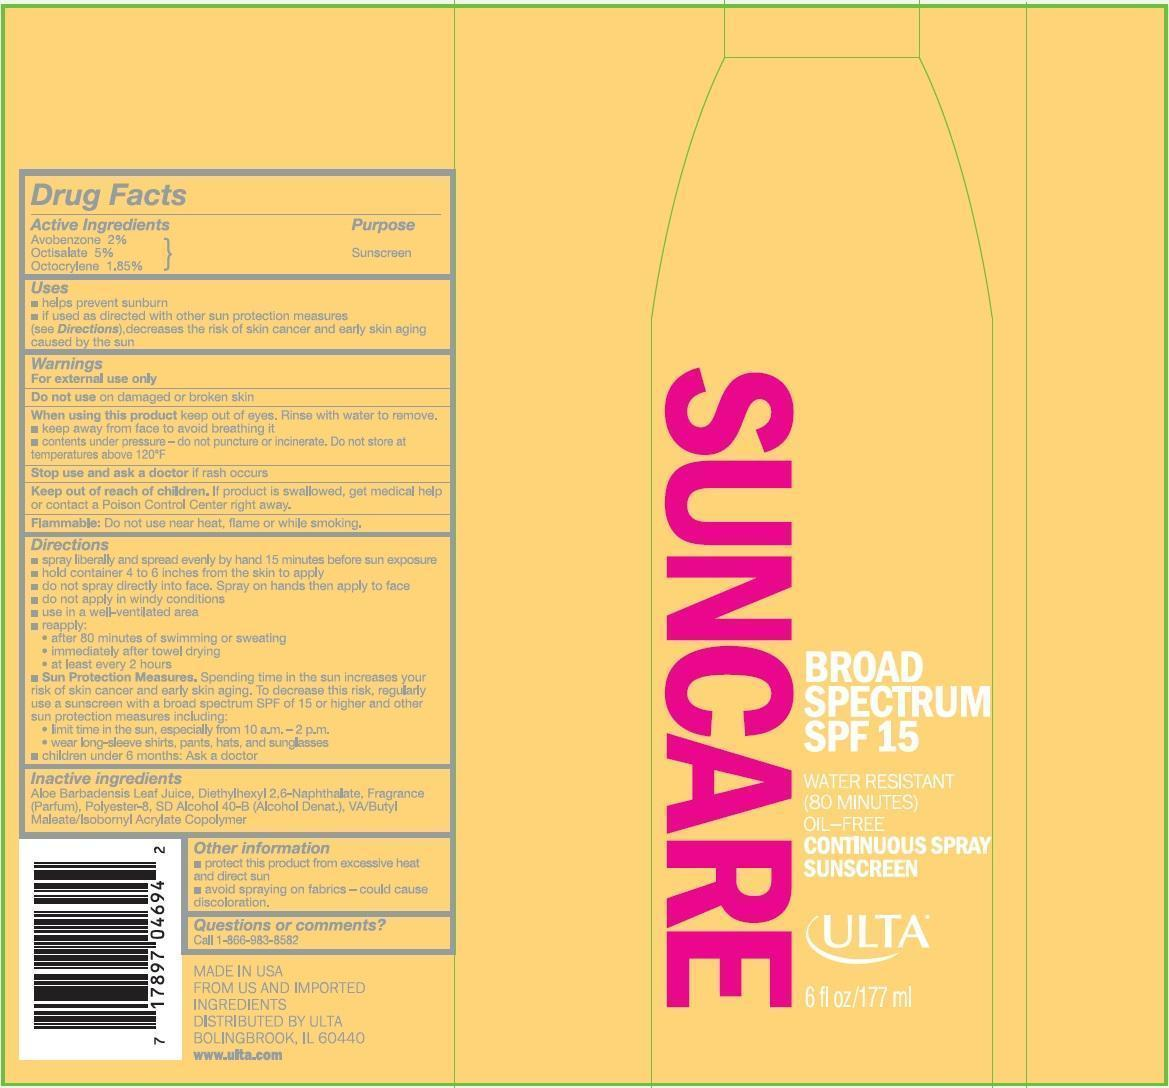 Ulta Broad Spectrum Spf 15 (Avobenzone, Octisalate And Octocrylene) Spray [Prime Packaging, Inc.]